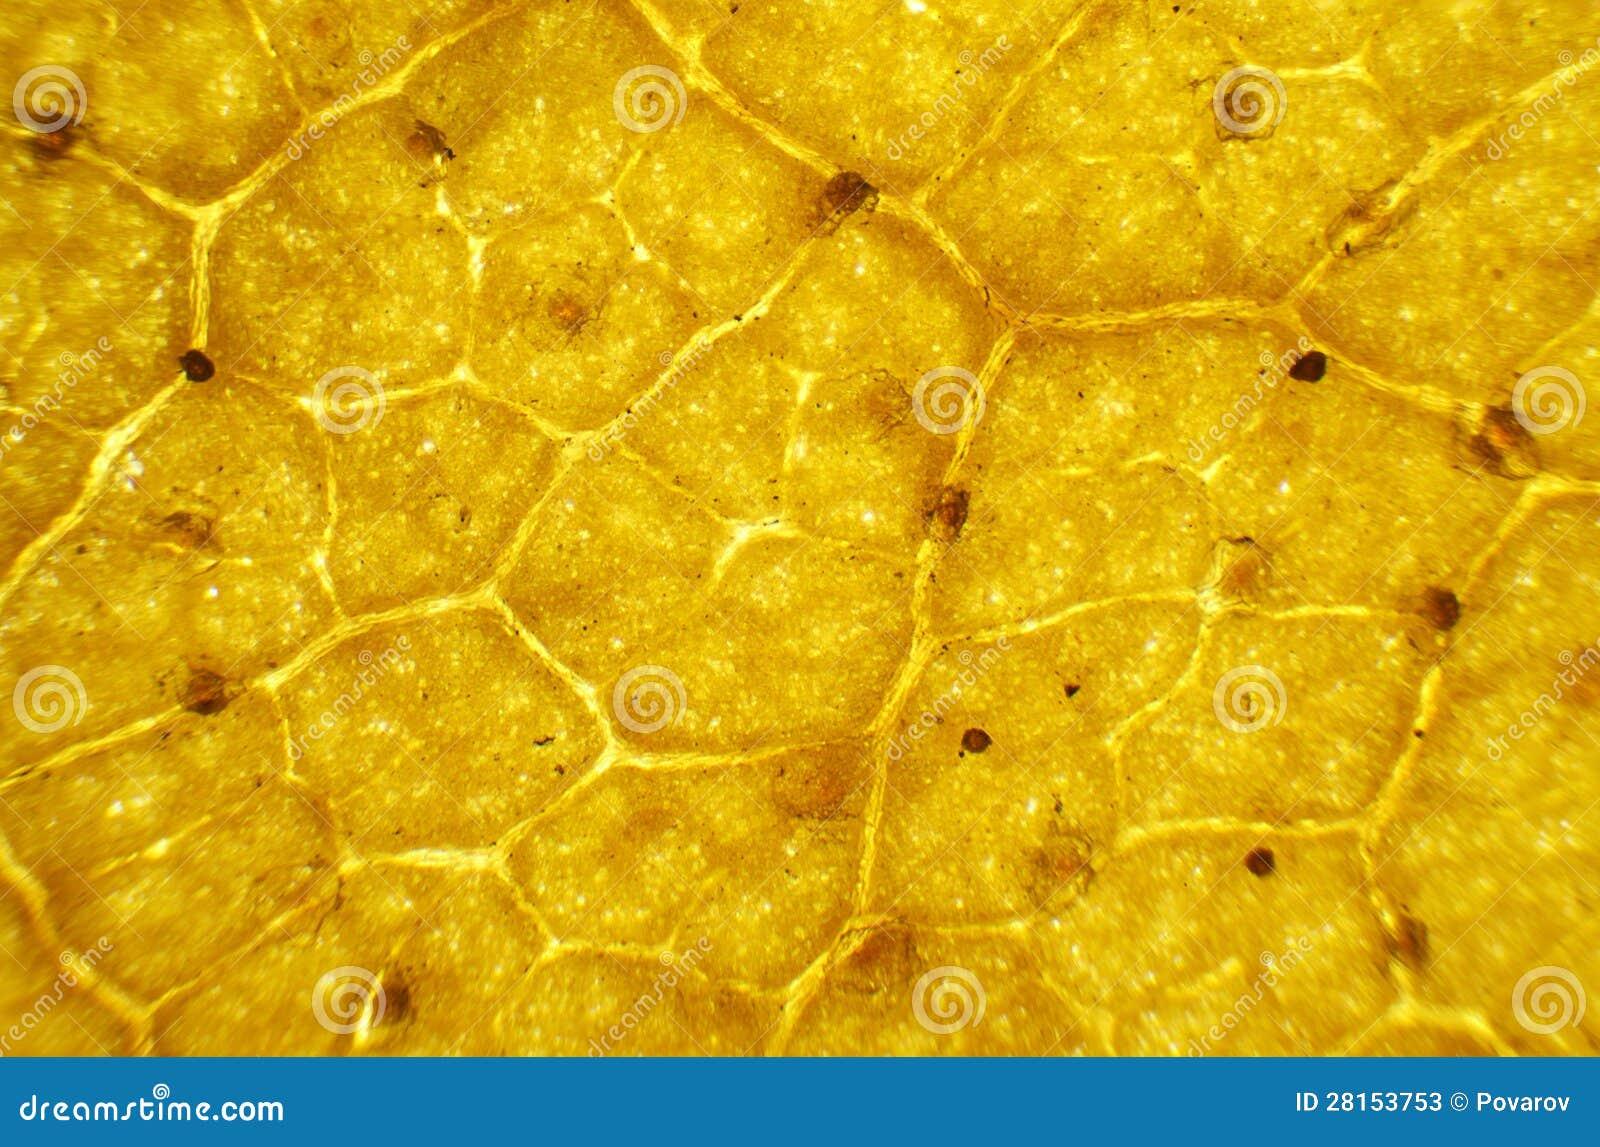 Birch Leaf Under The Microscope Stock Photos Image 28153753